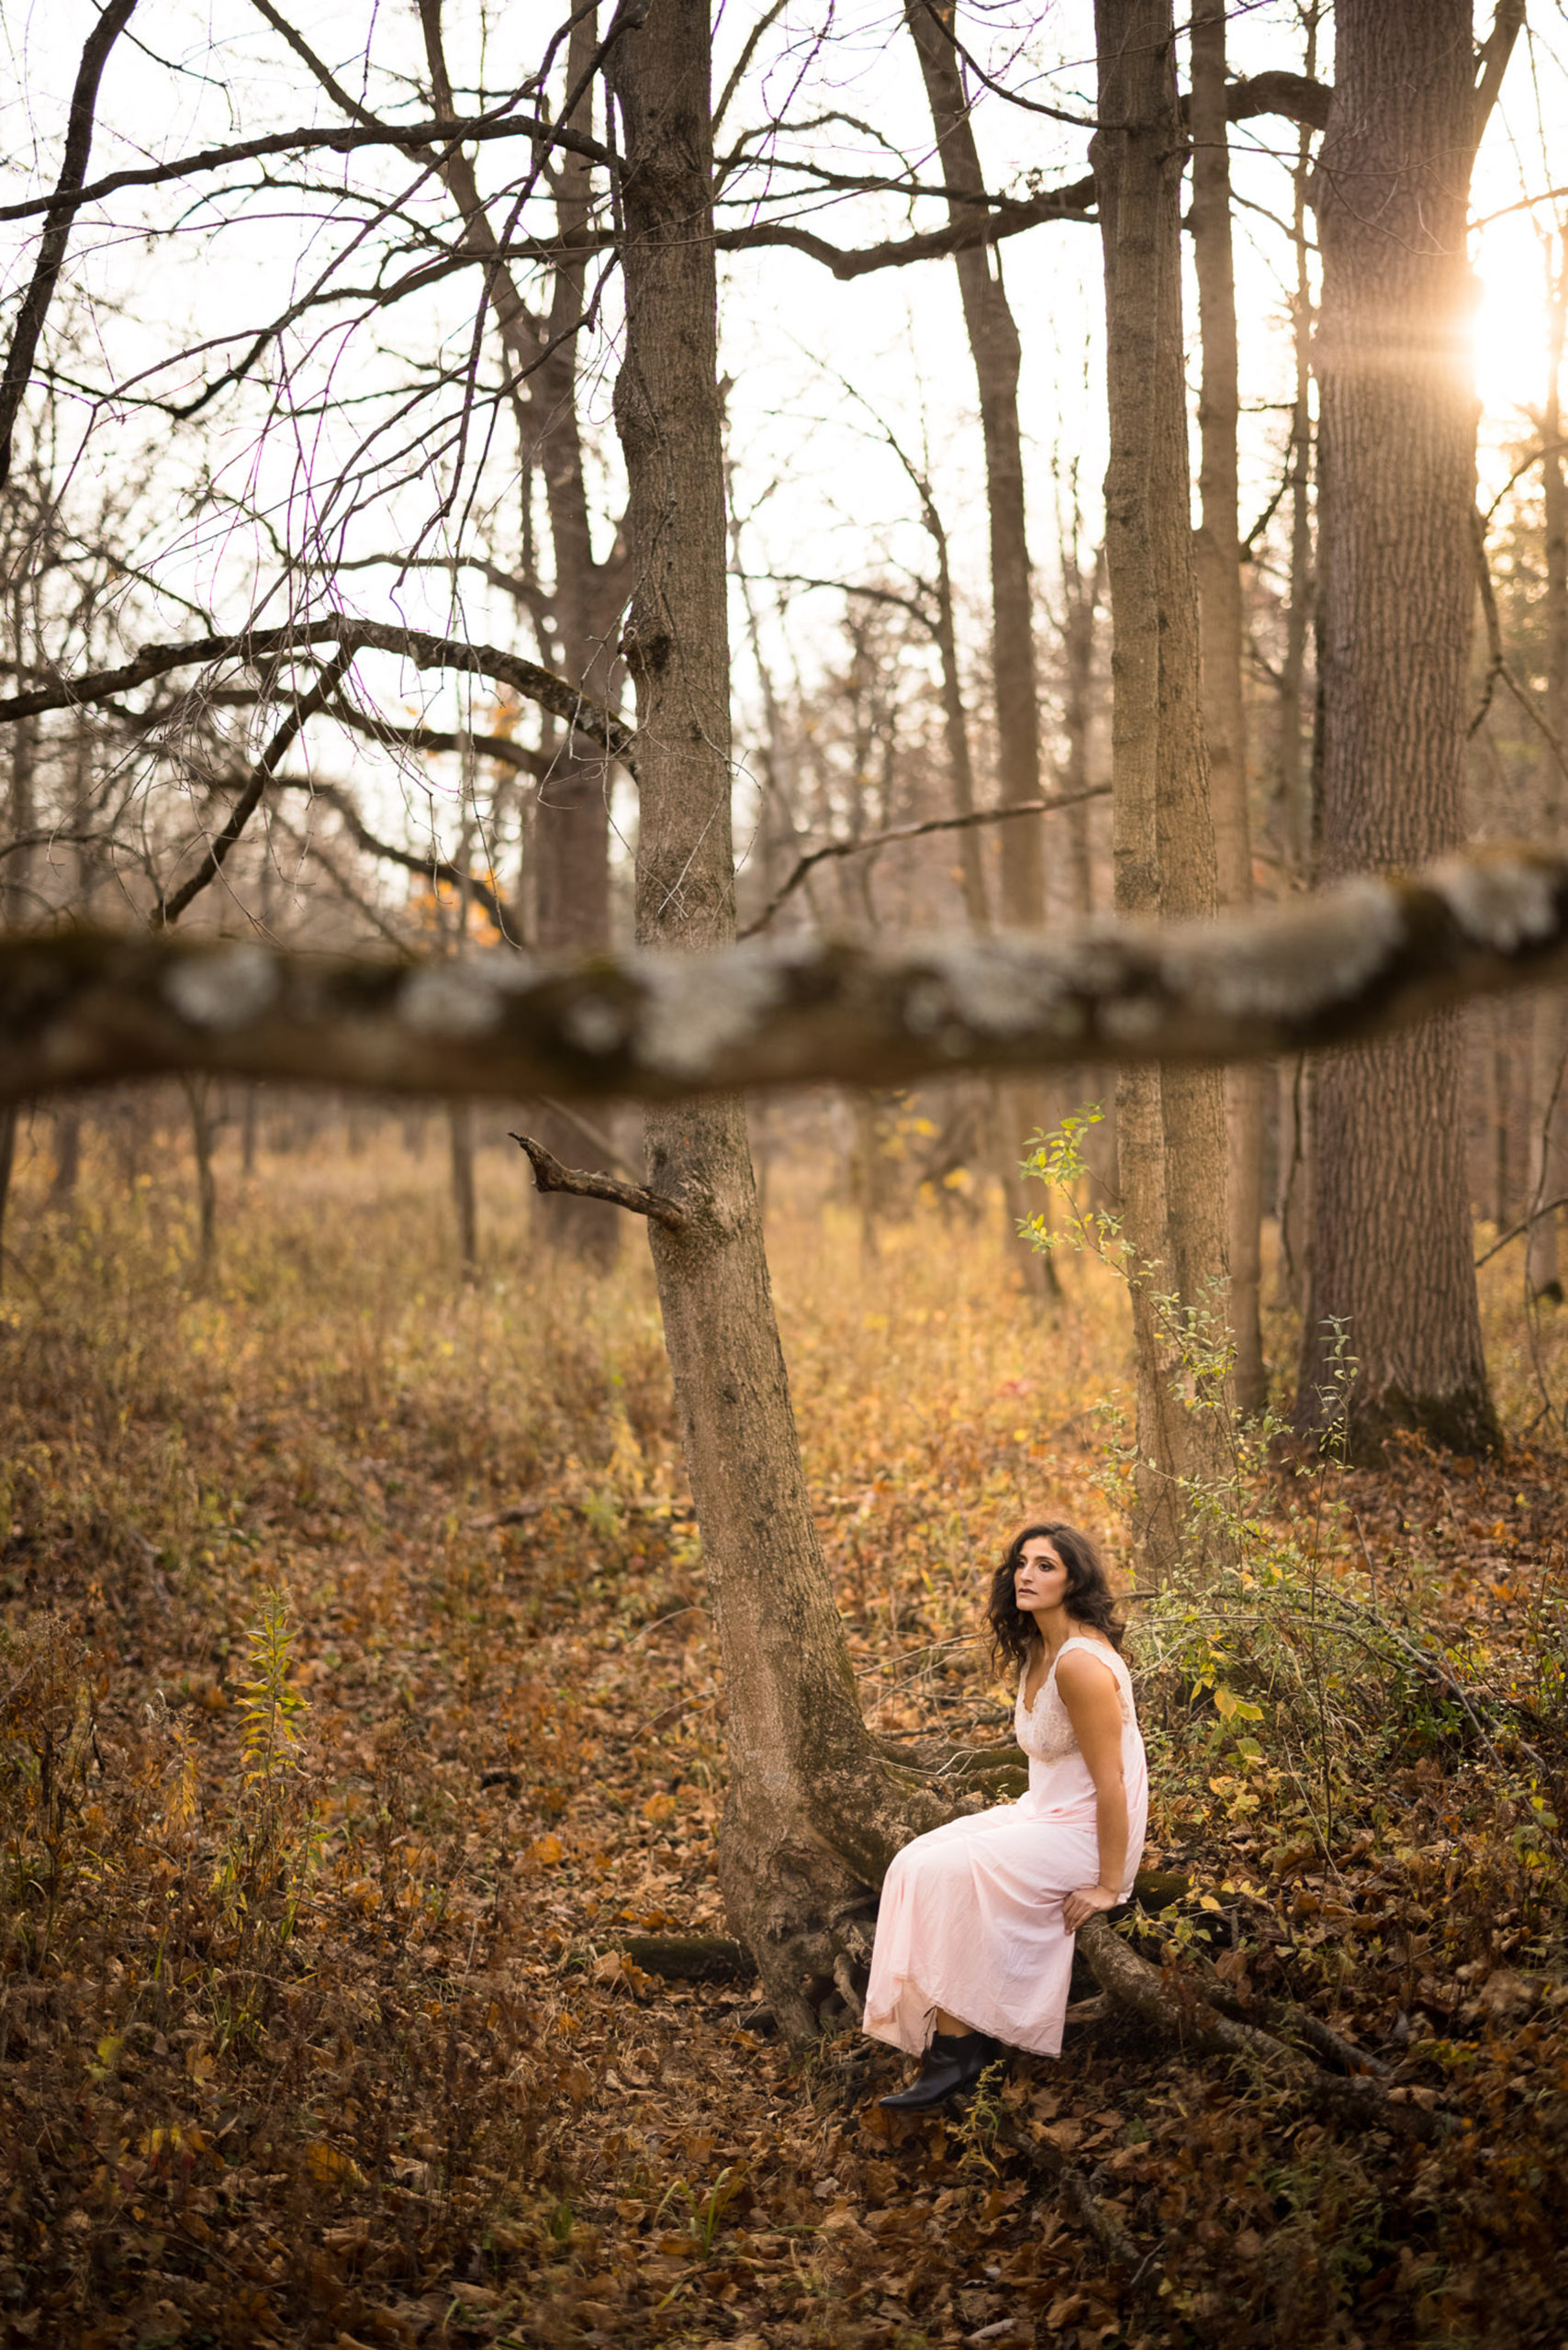 classic outdoor boudoir pink dress art hamilton photographer afterglow